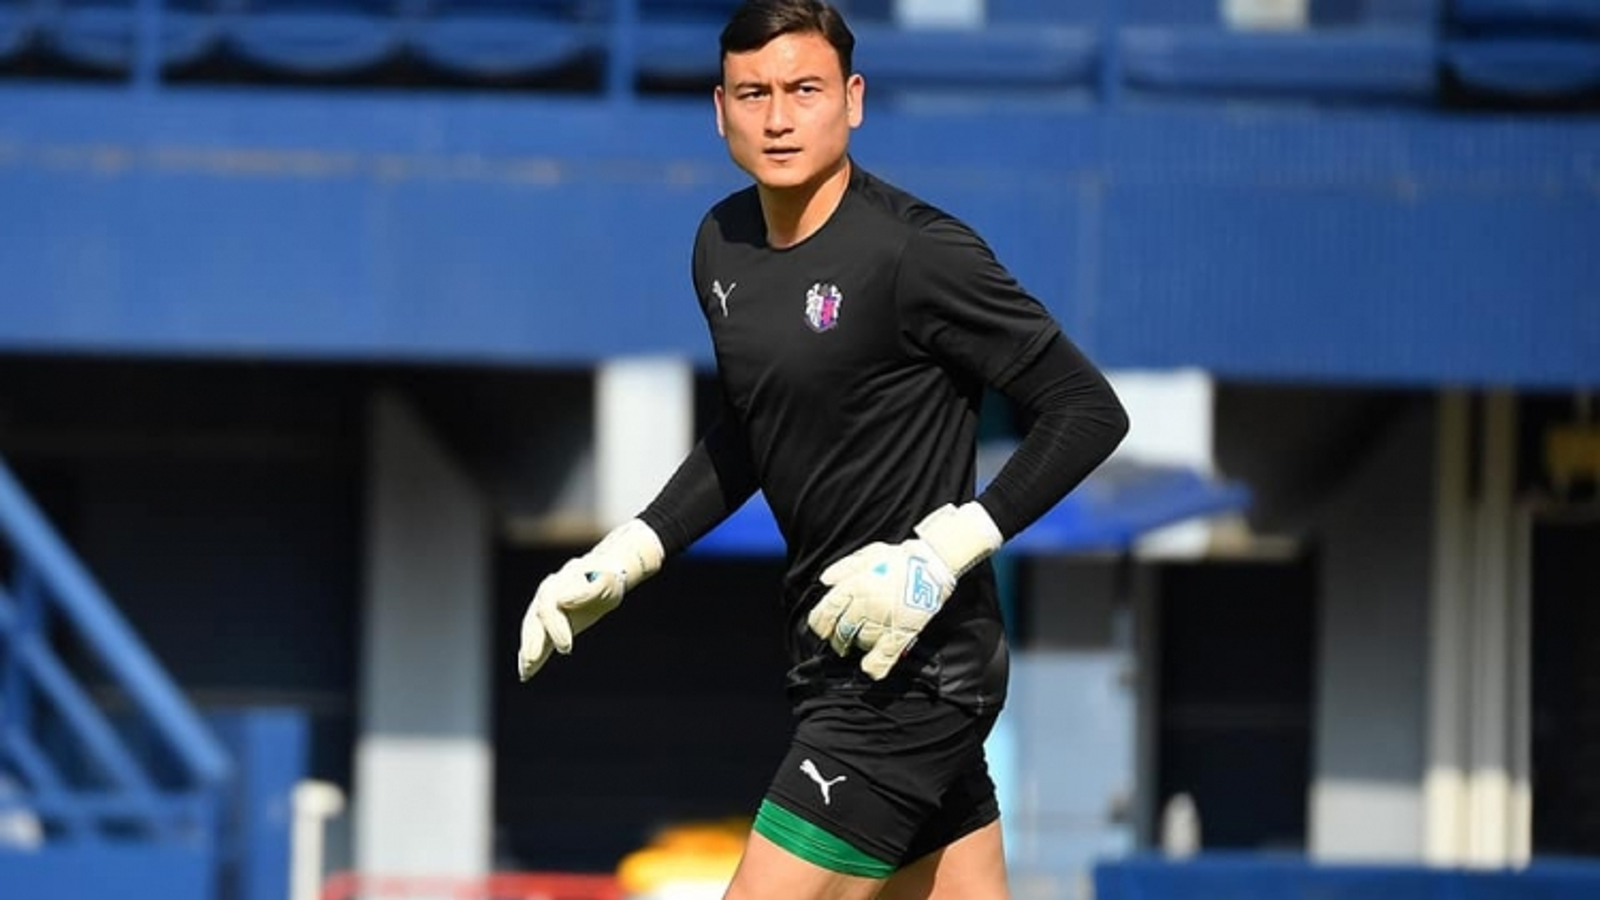 Văn Lâm có cơ hội cùng Cerezo Osaka vượt qua vòng bảng AFC Champions League